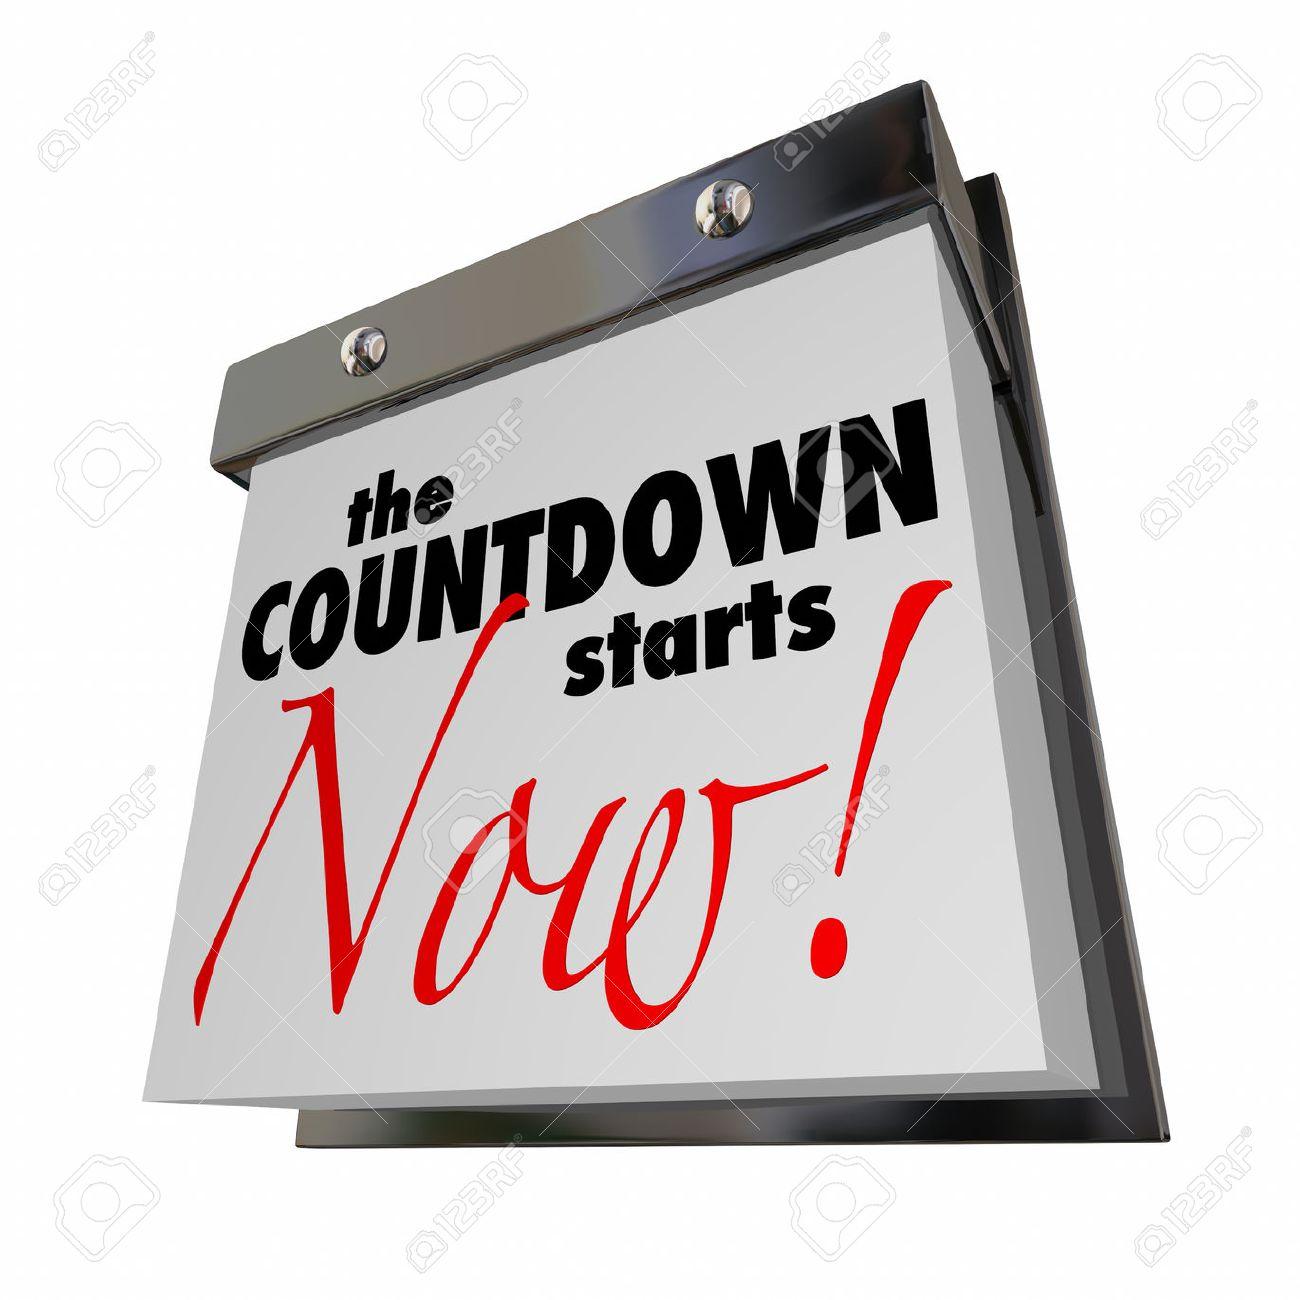 Calendario Countdown.Countdown Starts Now Calendar Day Date Final Words